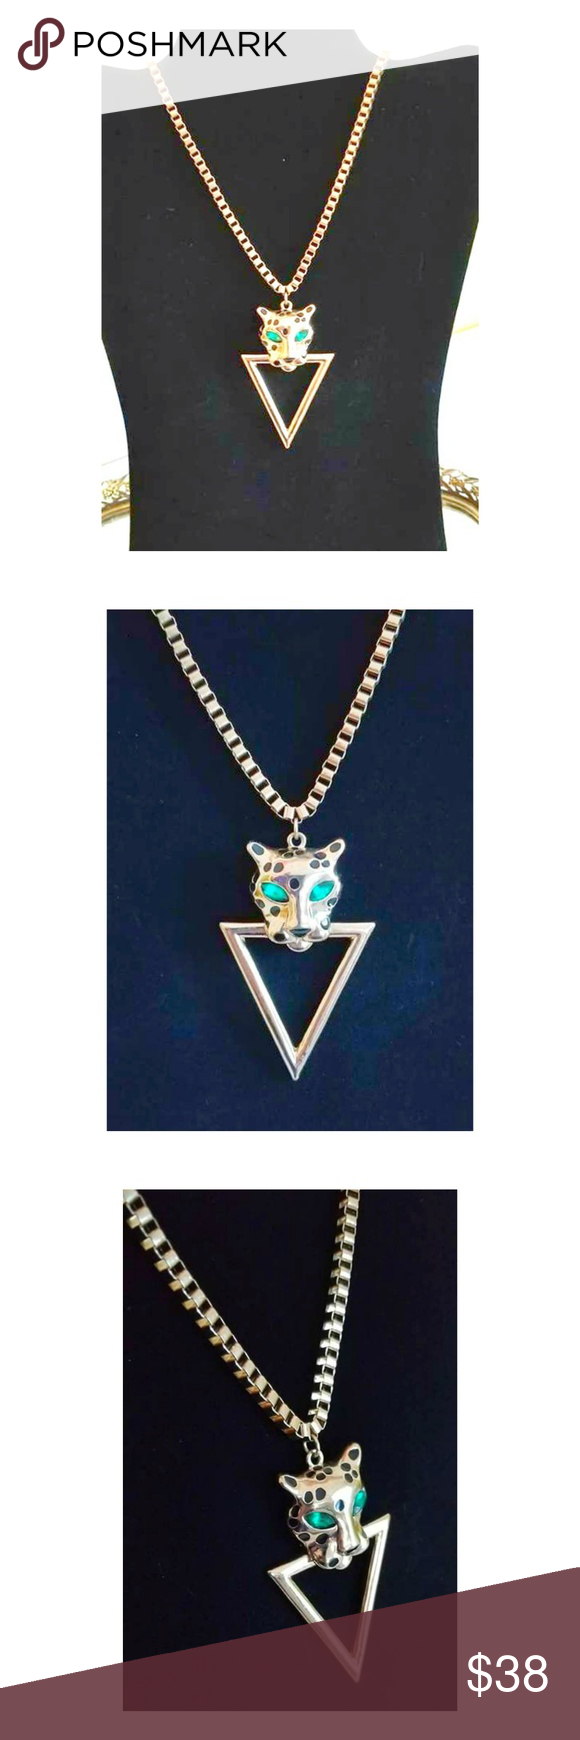 Vtg art deco leopard door knocker necklace my posh picks